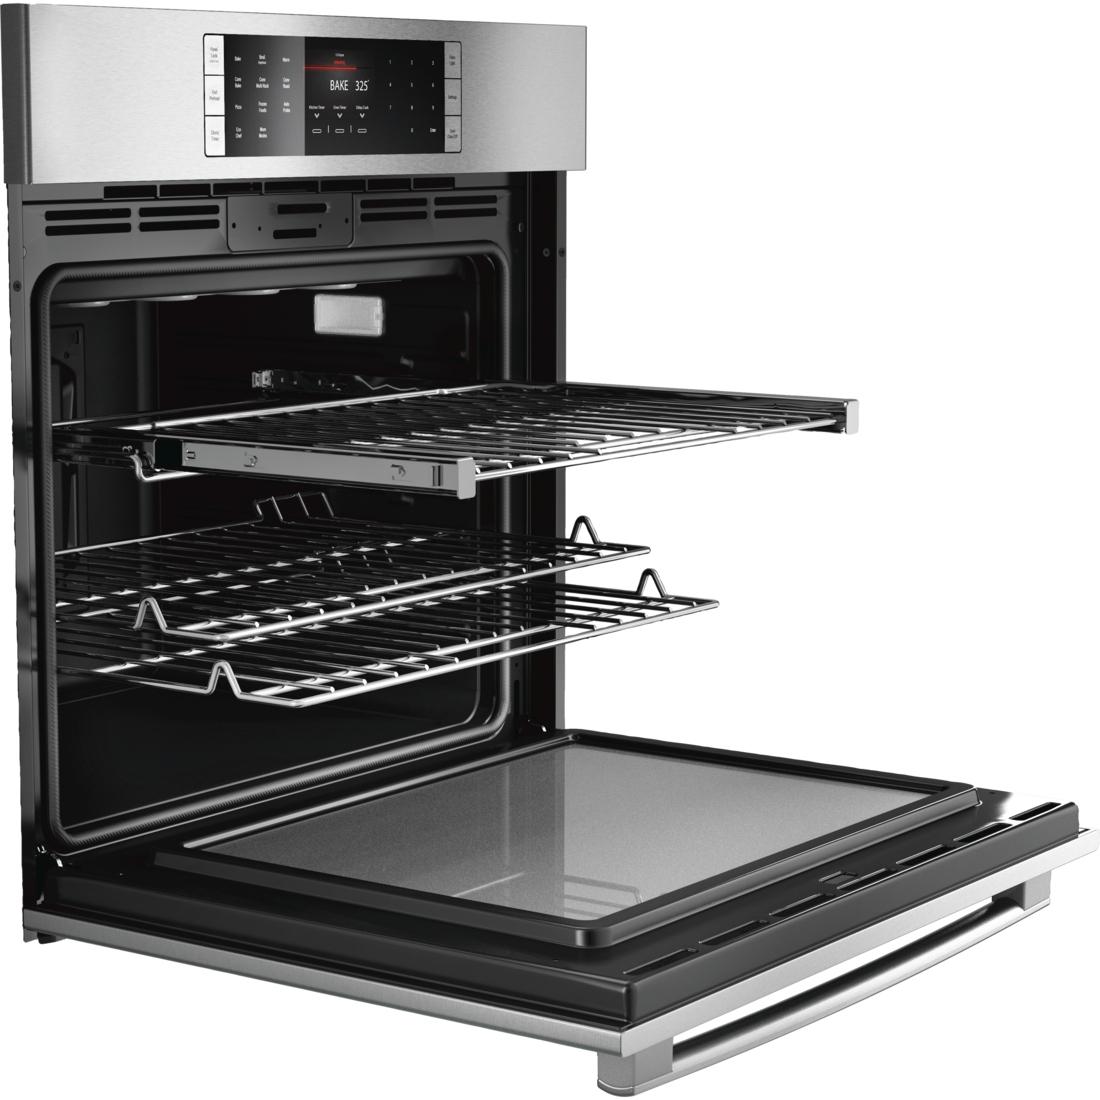 Cabanu_electrodomestico_MCSA00777733_Bosch-Single-Oven-HBLP451UC-INTERIOR-Open-Door-Extension-Rack_def.jpg